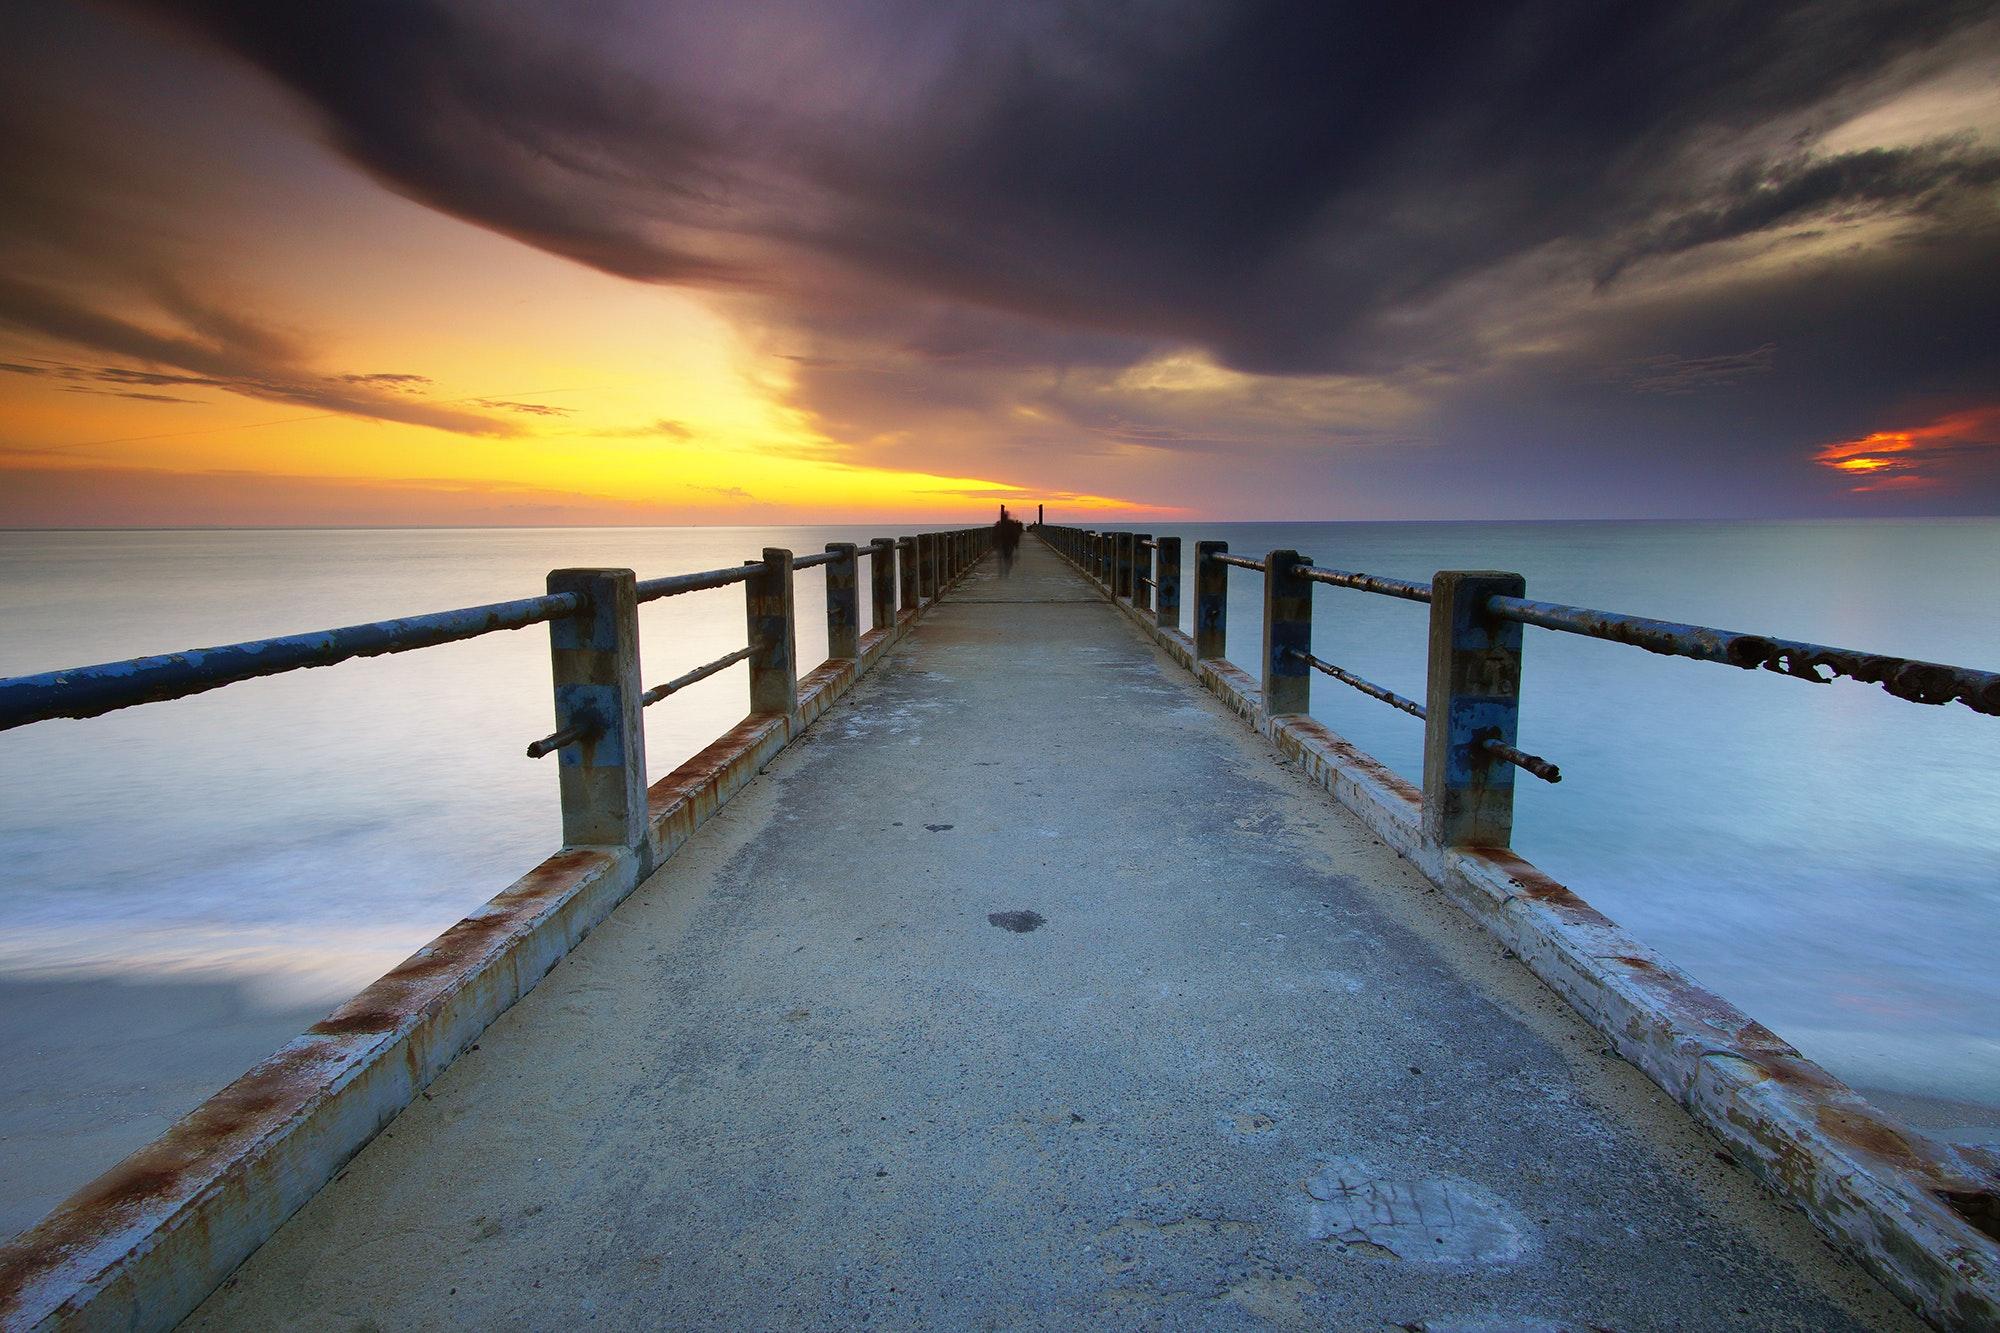 Gray Bridge Near White Water, Beach, Ocean, Sunset, Sunrise, HQ Photo